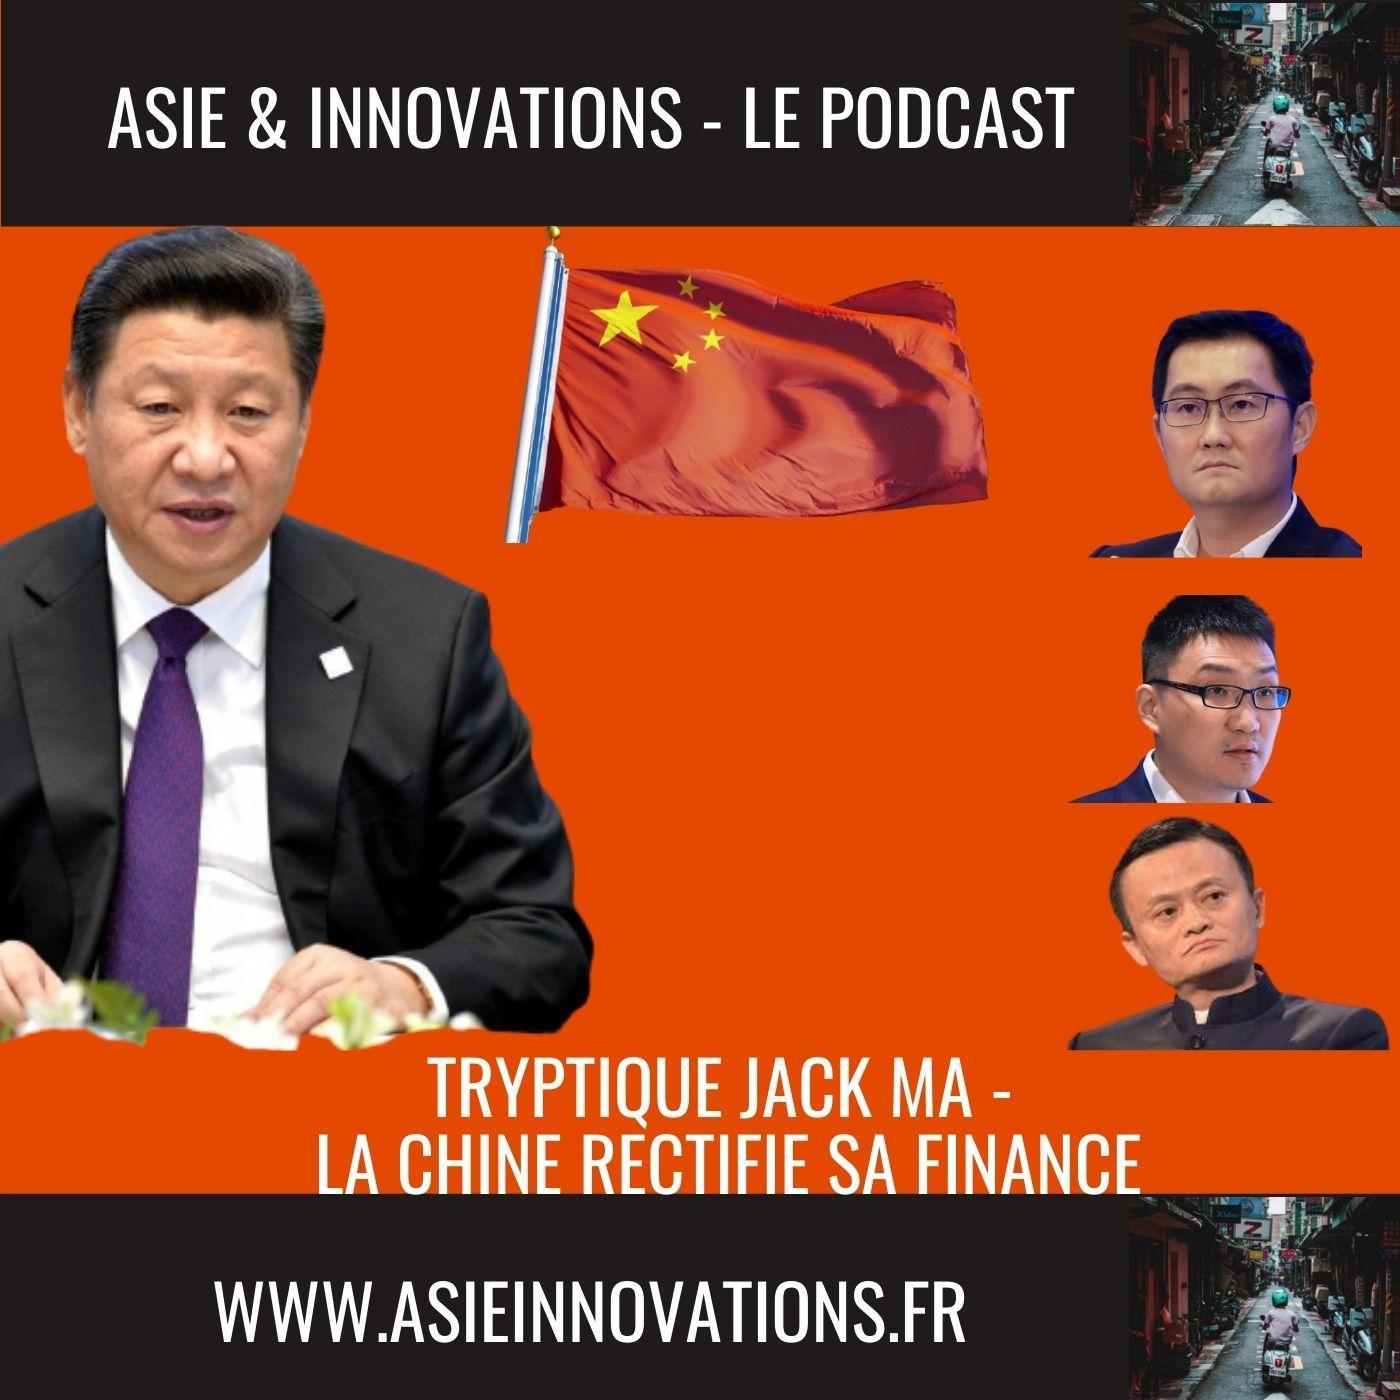 Tryptique Jack Ma : La chine rectifie sa finance